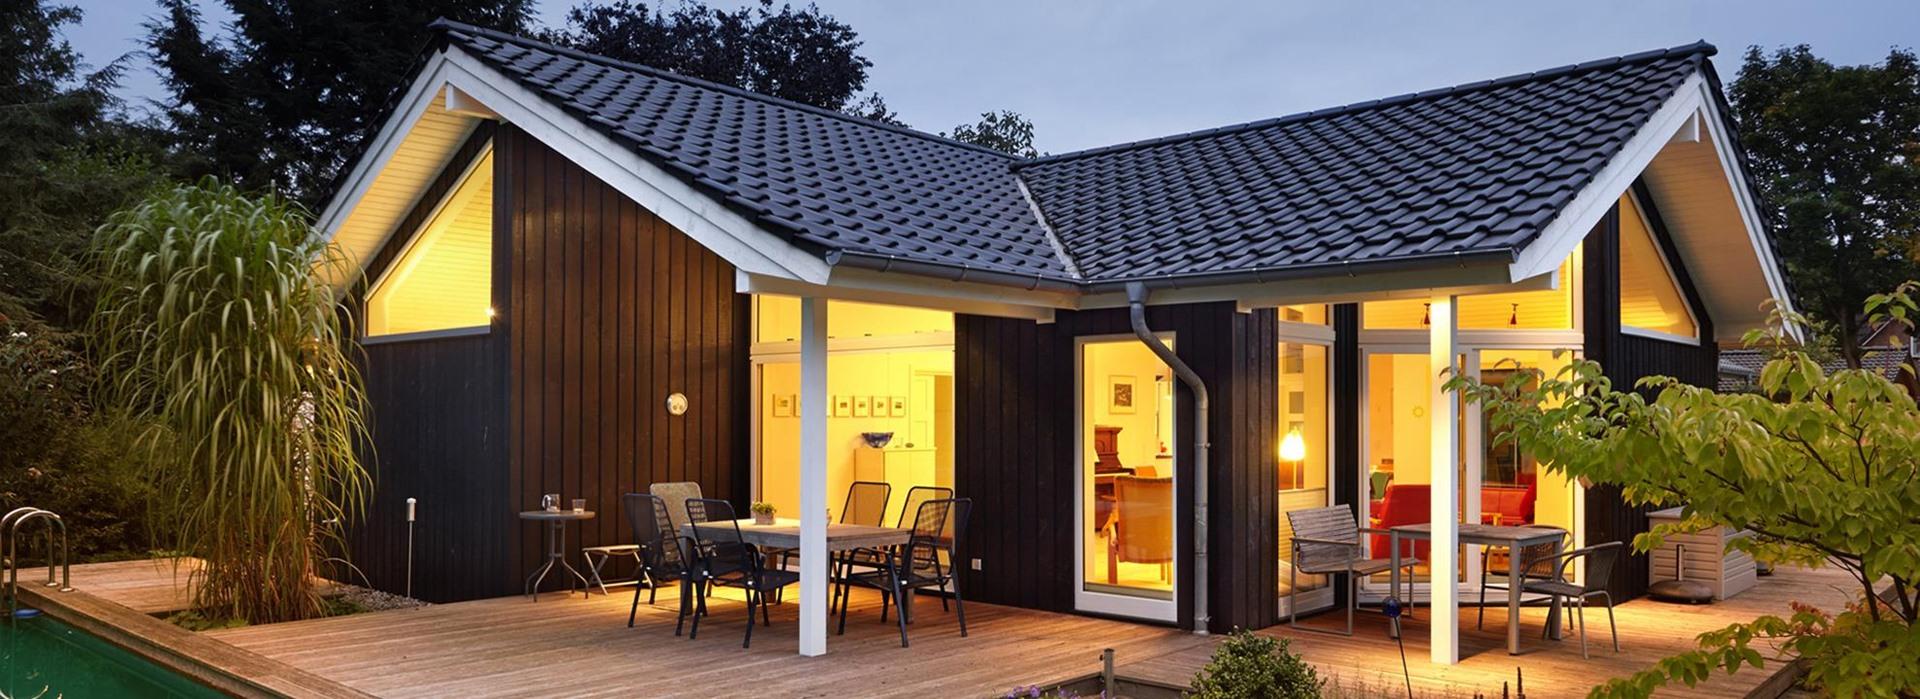 EBK Skandinavische Architektenhäuser